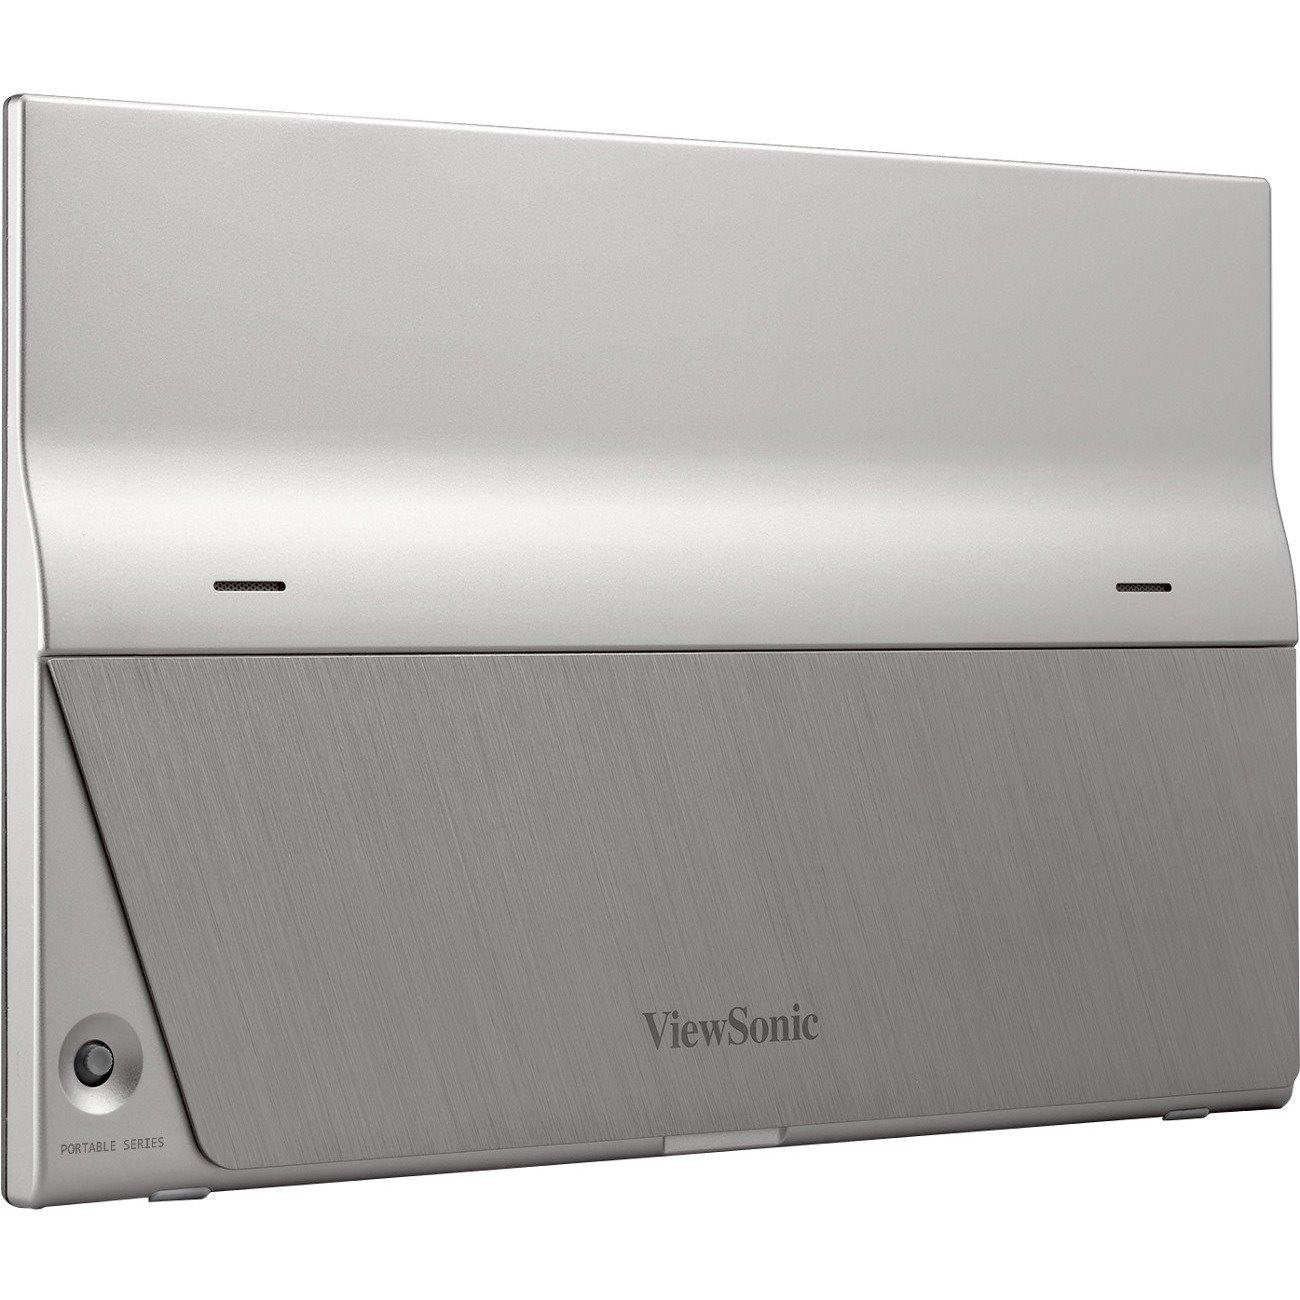 "Viewsonic TD1655 39.6 cm (15.6"") LCD Touchscreen Monitor - 16:9 - 6.50 ms GTG (OD)"